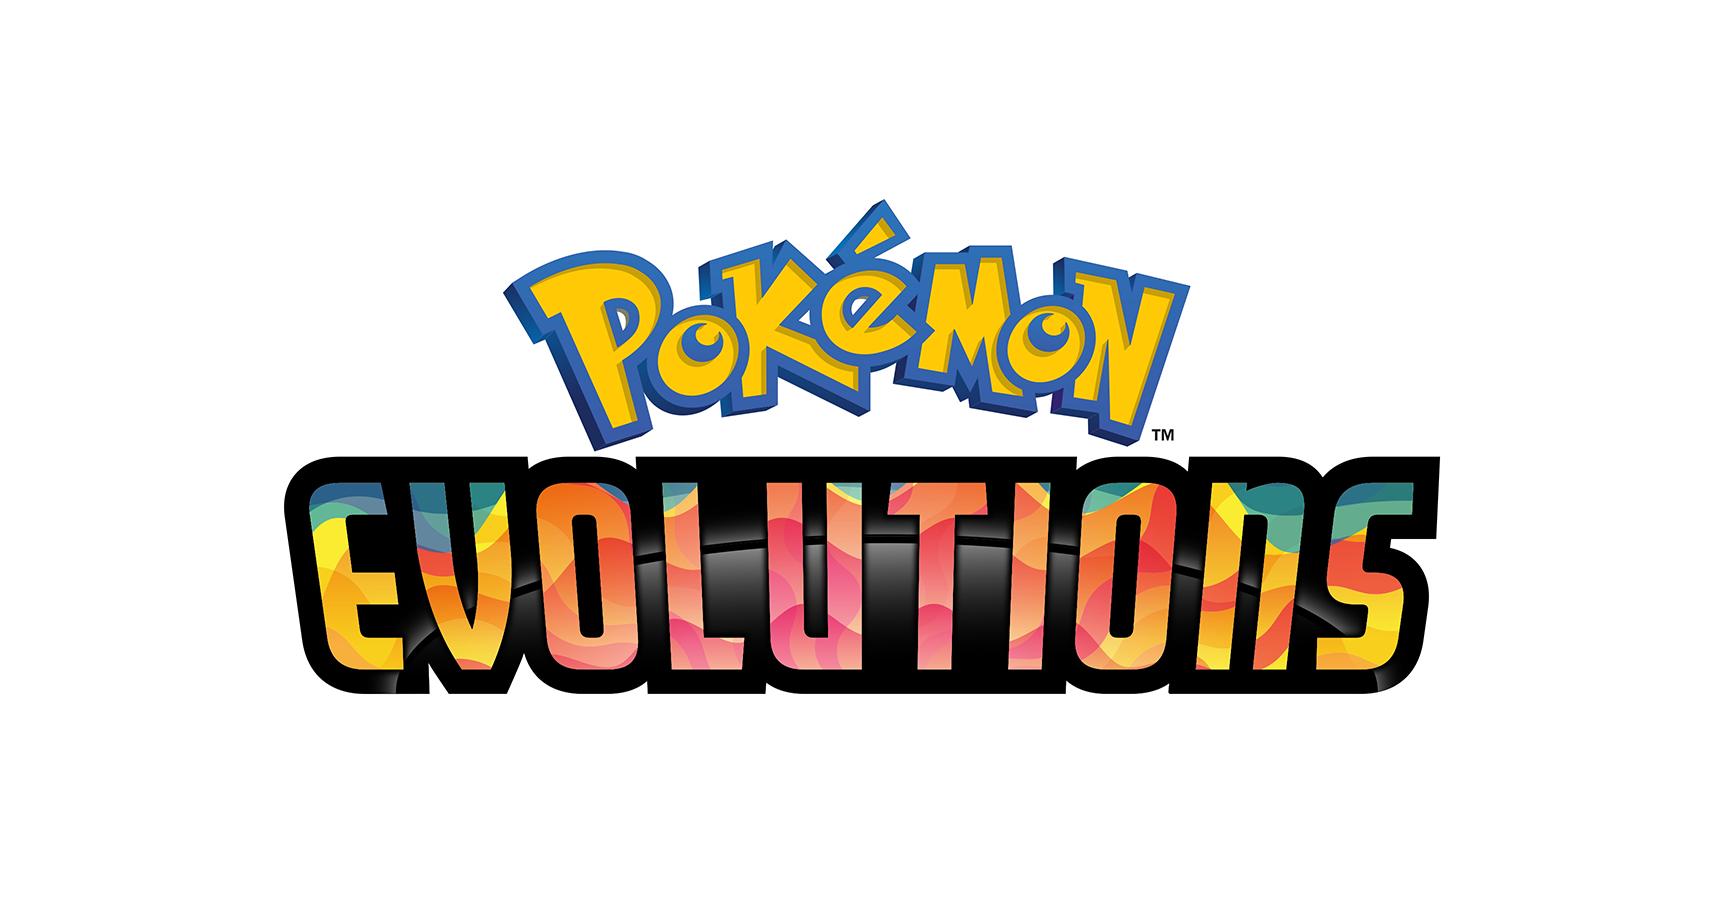 Pokemon Evolutions anime